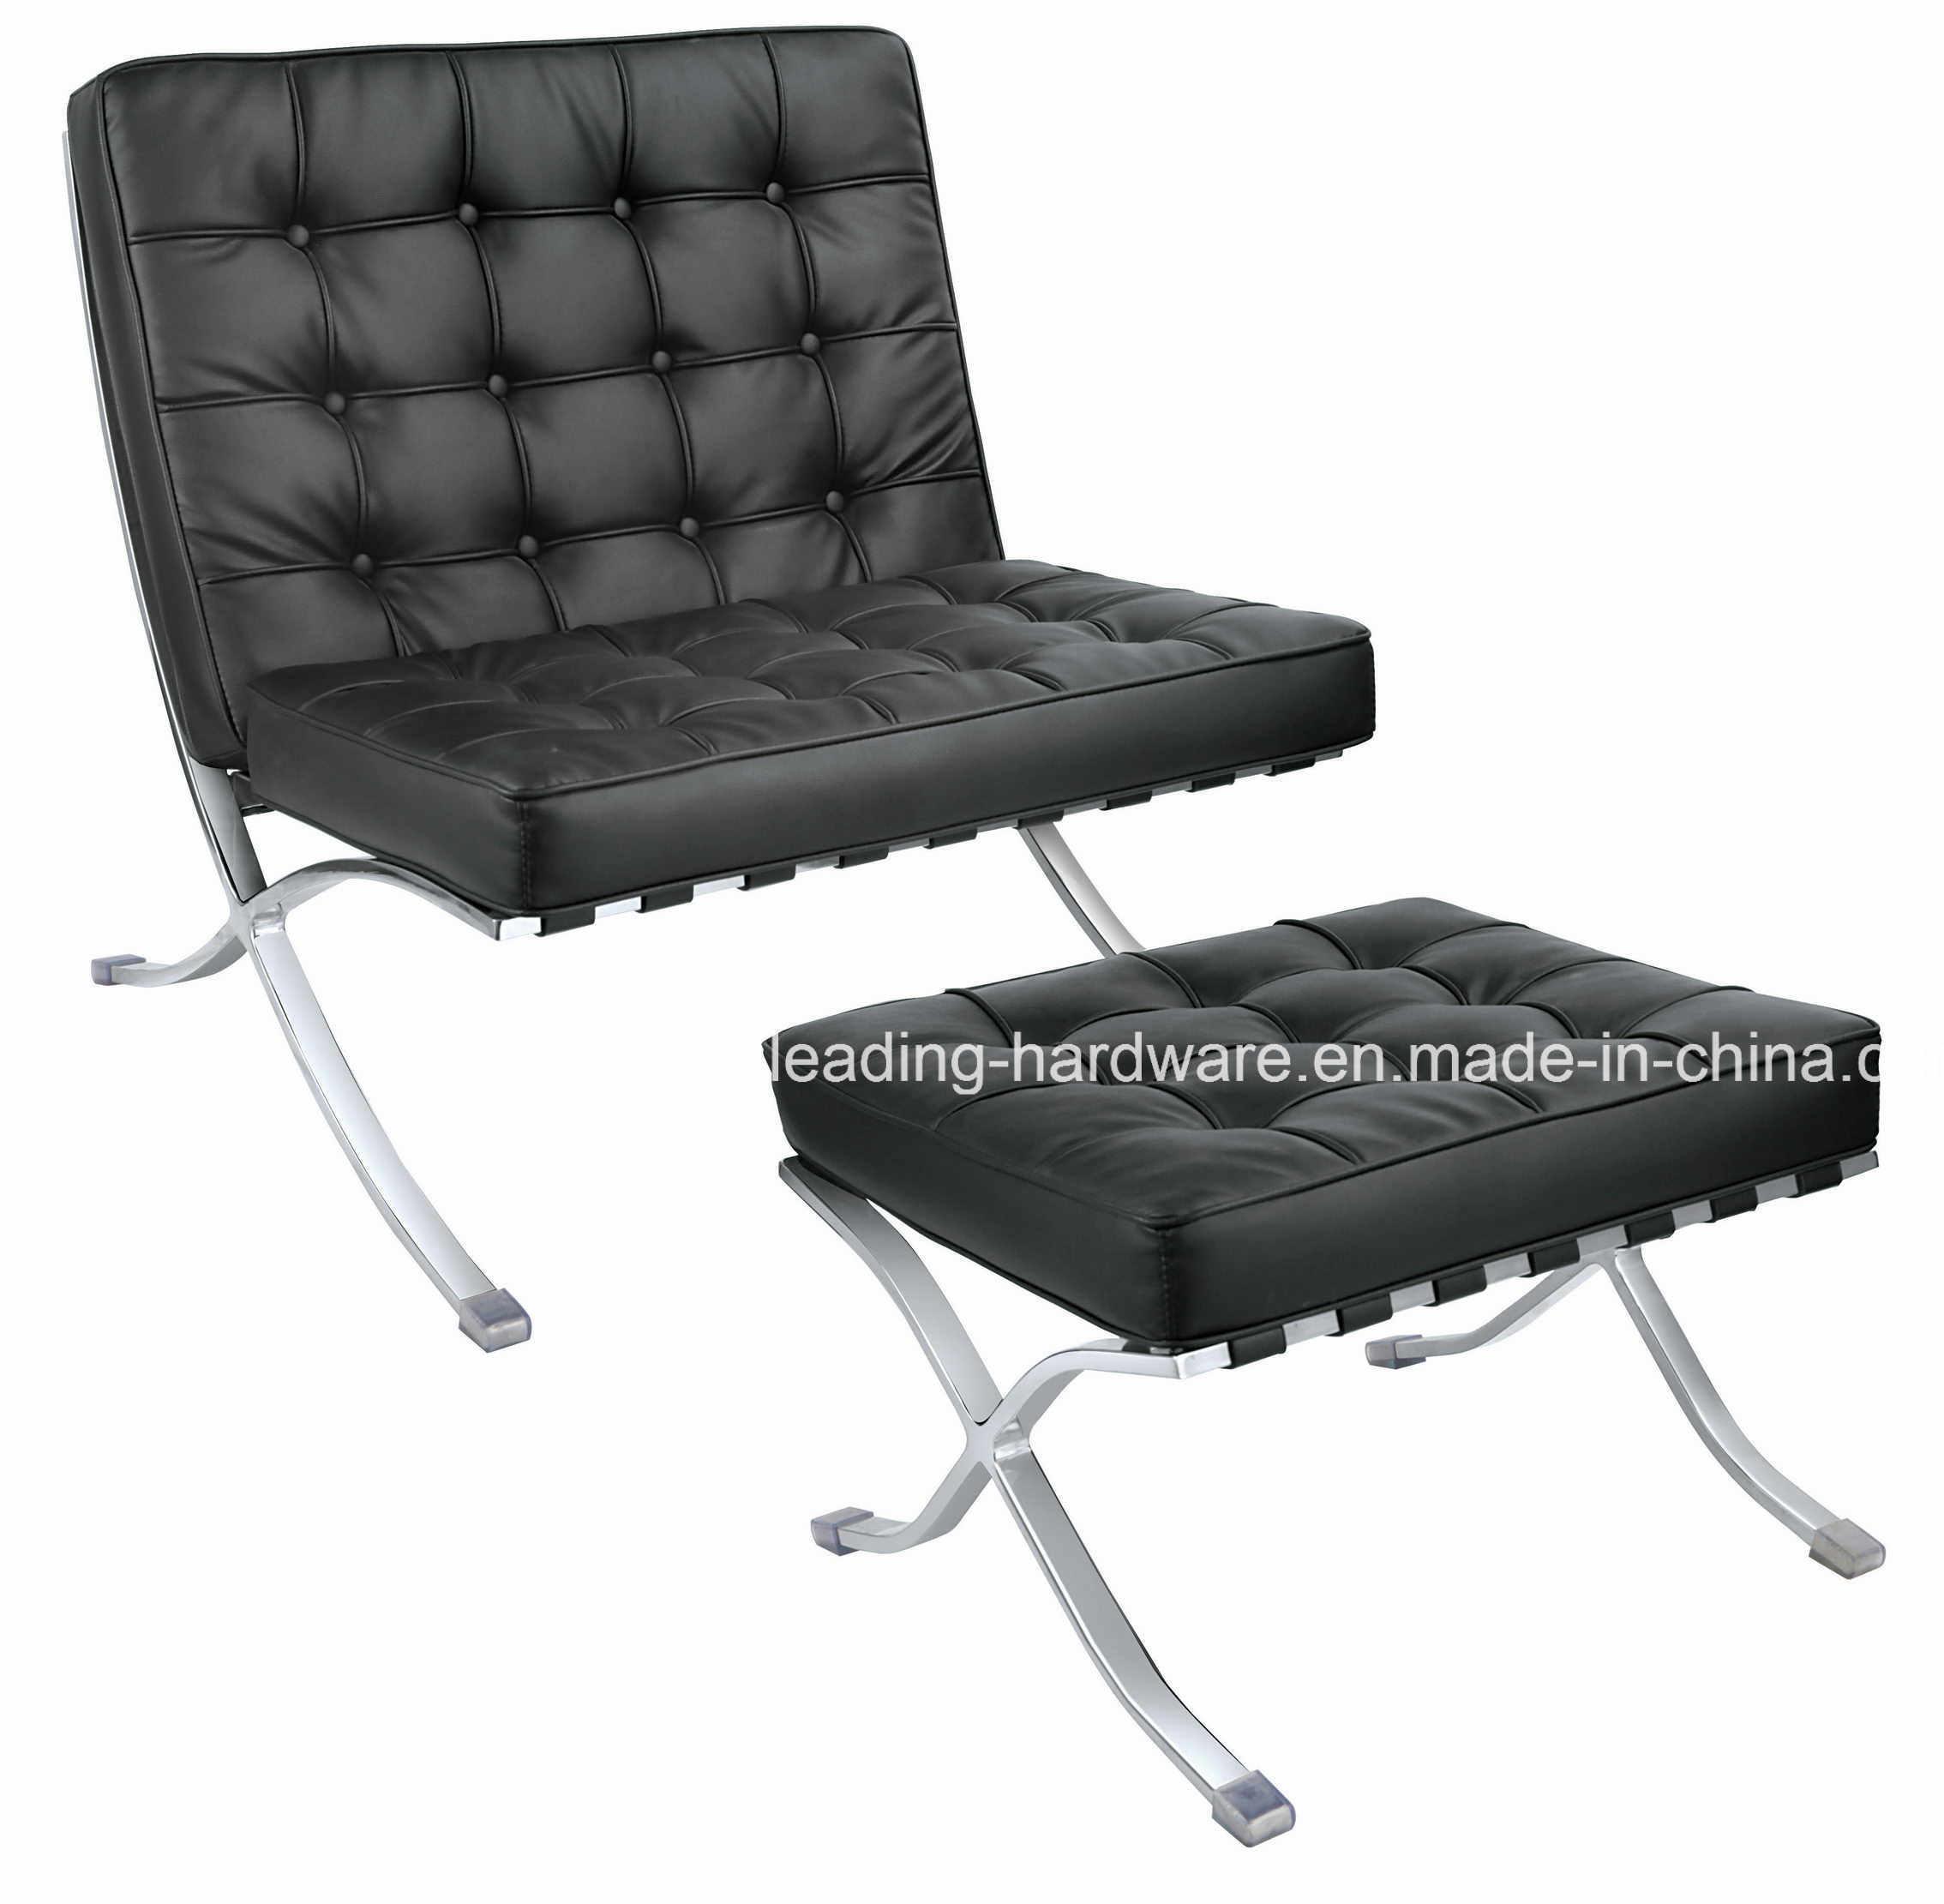 Factory Replica Barcelona Sofa Chair